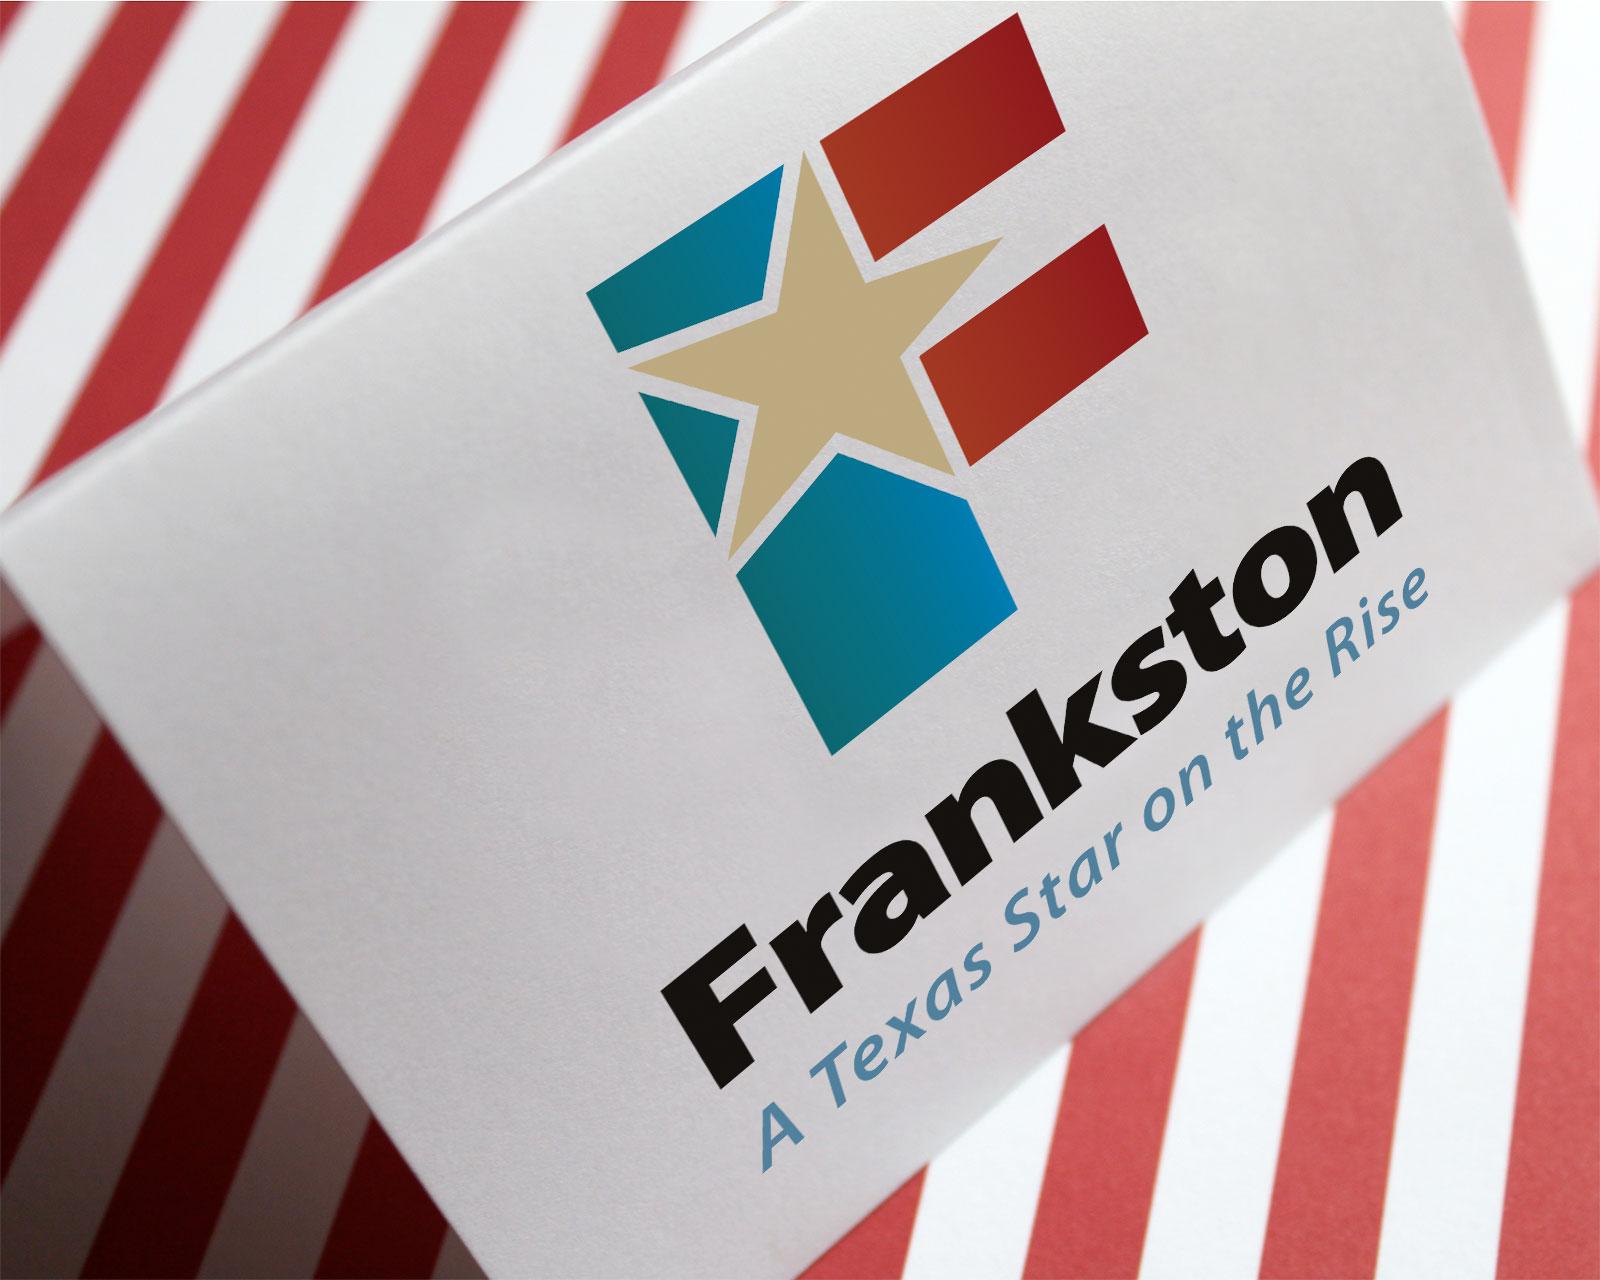 Logo design for the City of Frankston